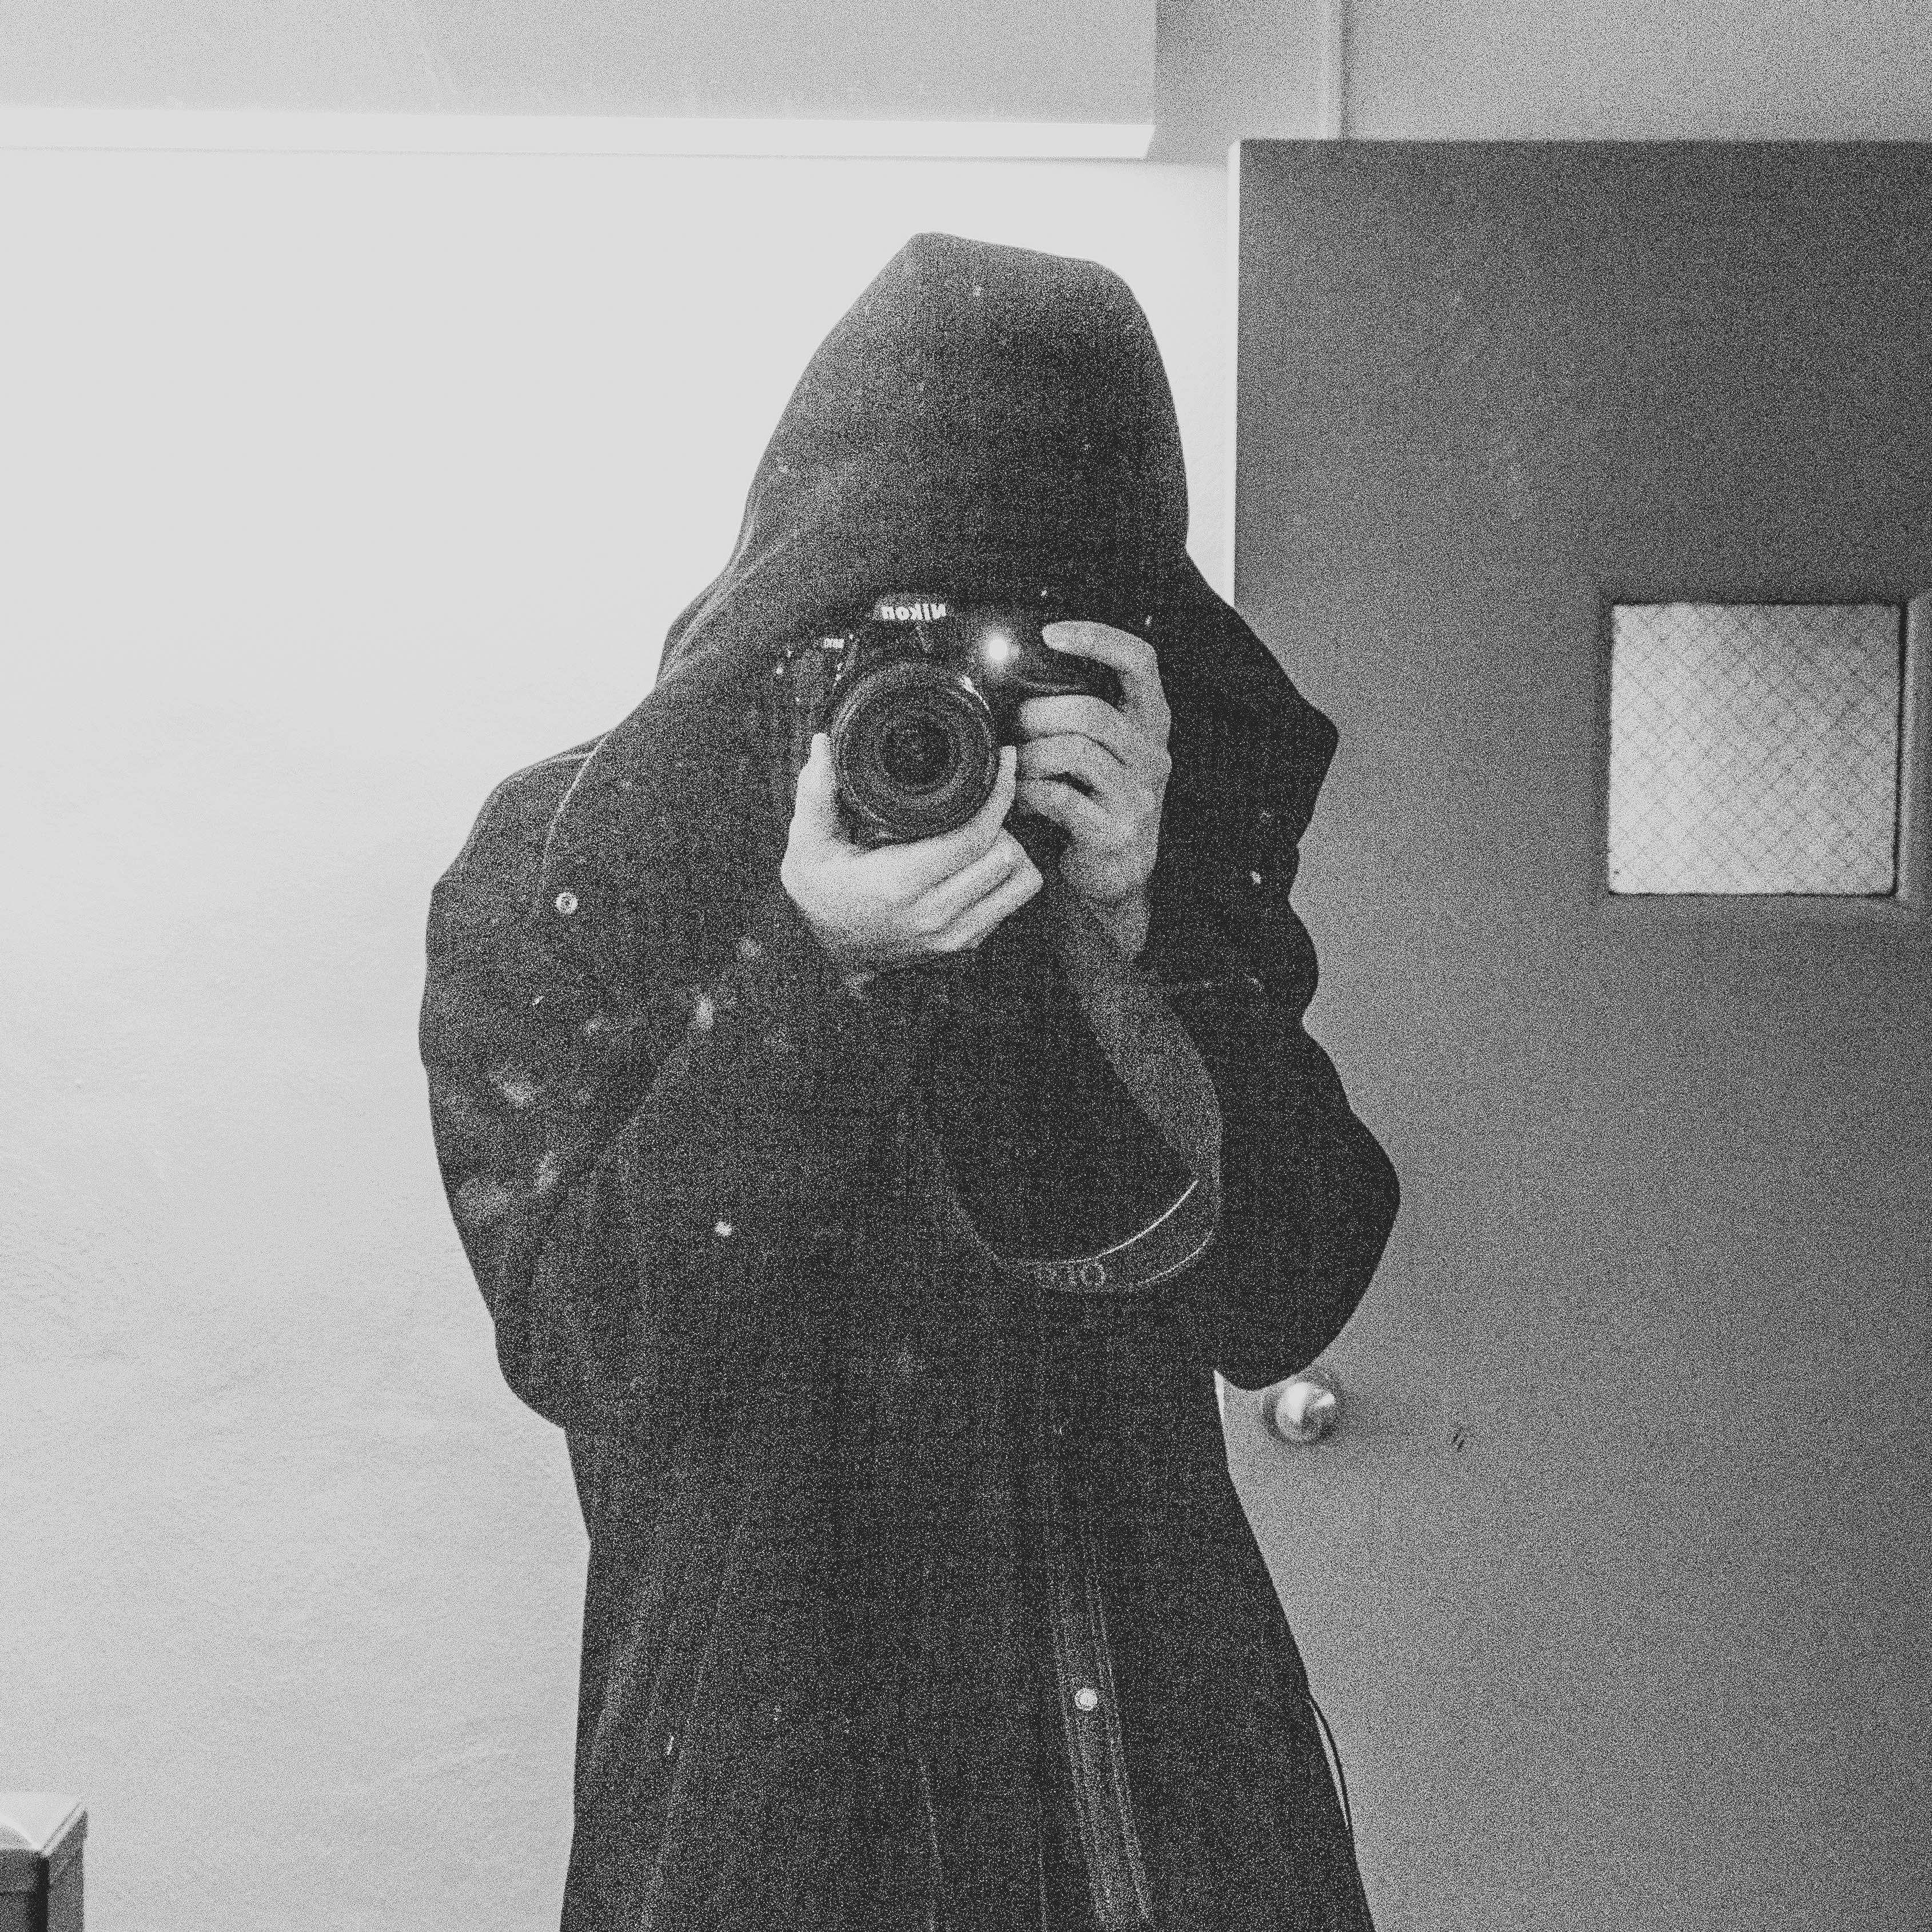 Gratis arkivbilde med person med kamera